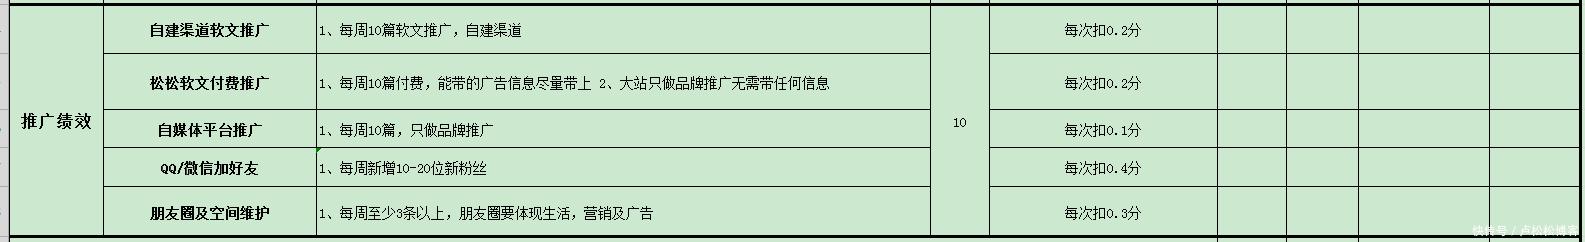 t01c7476ac756602cf9.png